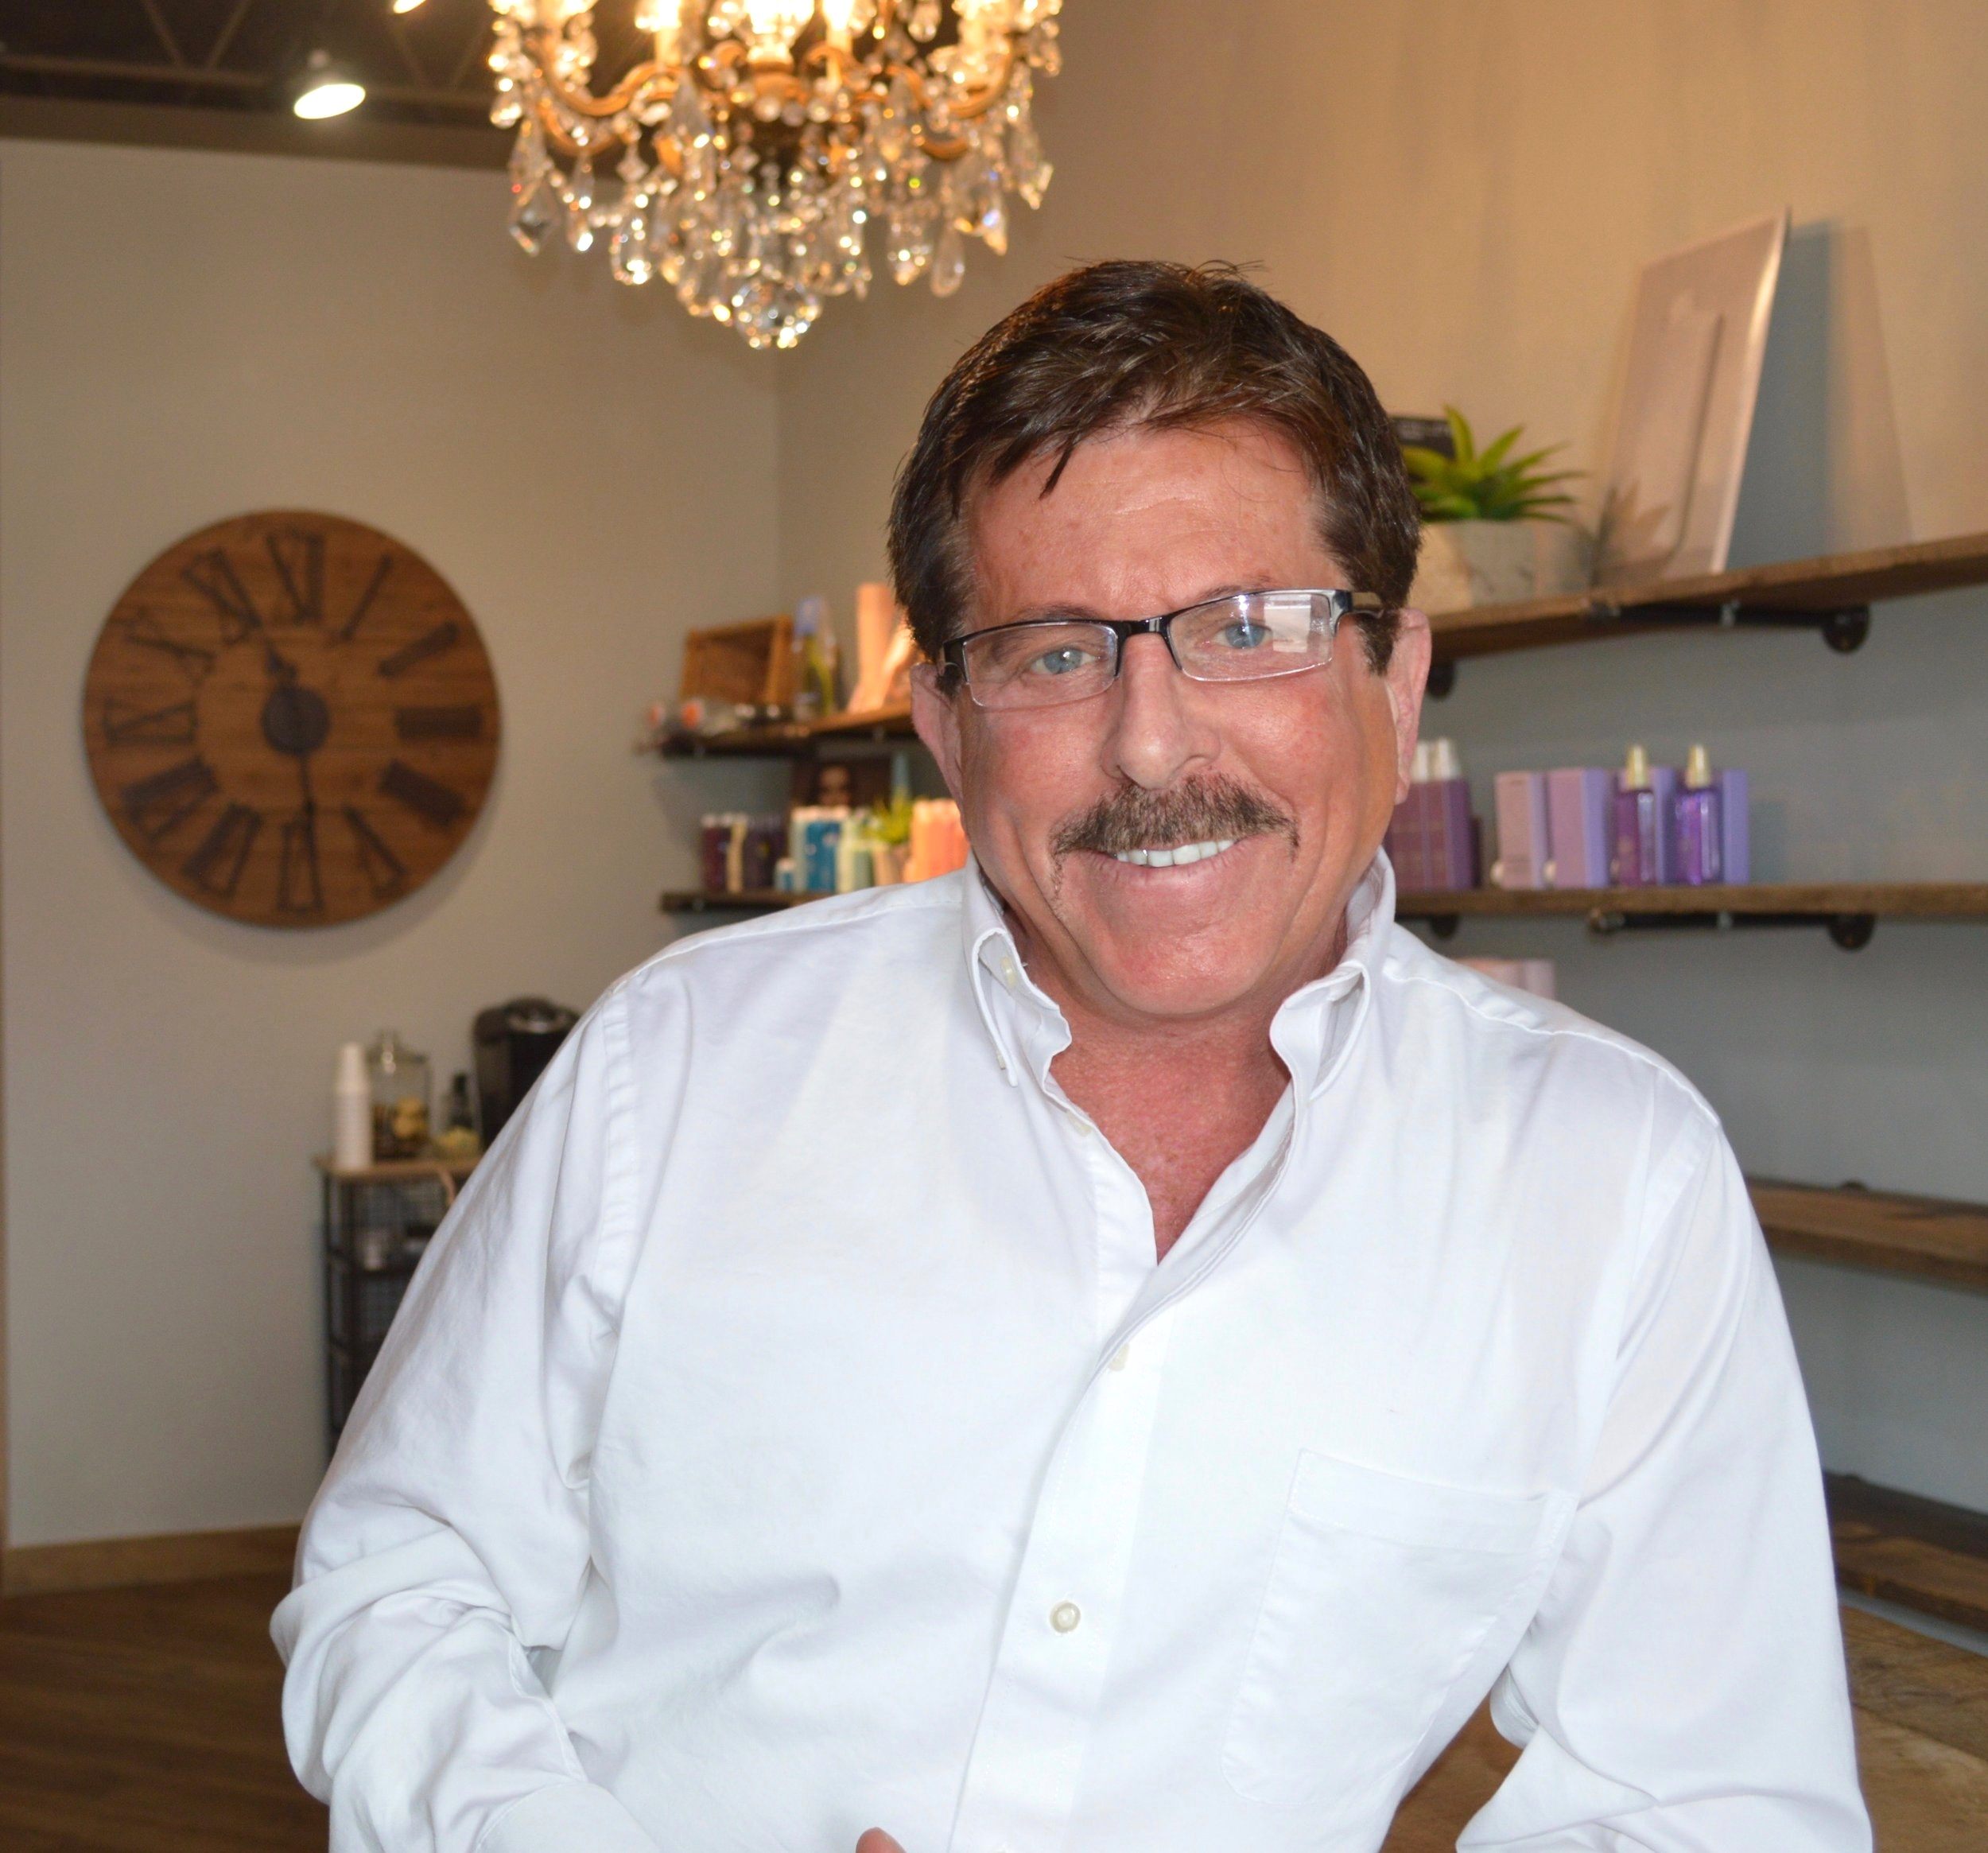 Frank Raso, stylist at Rian A Hair Studio in Akron, OH